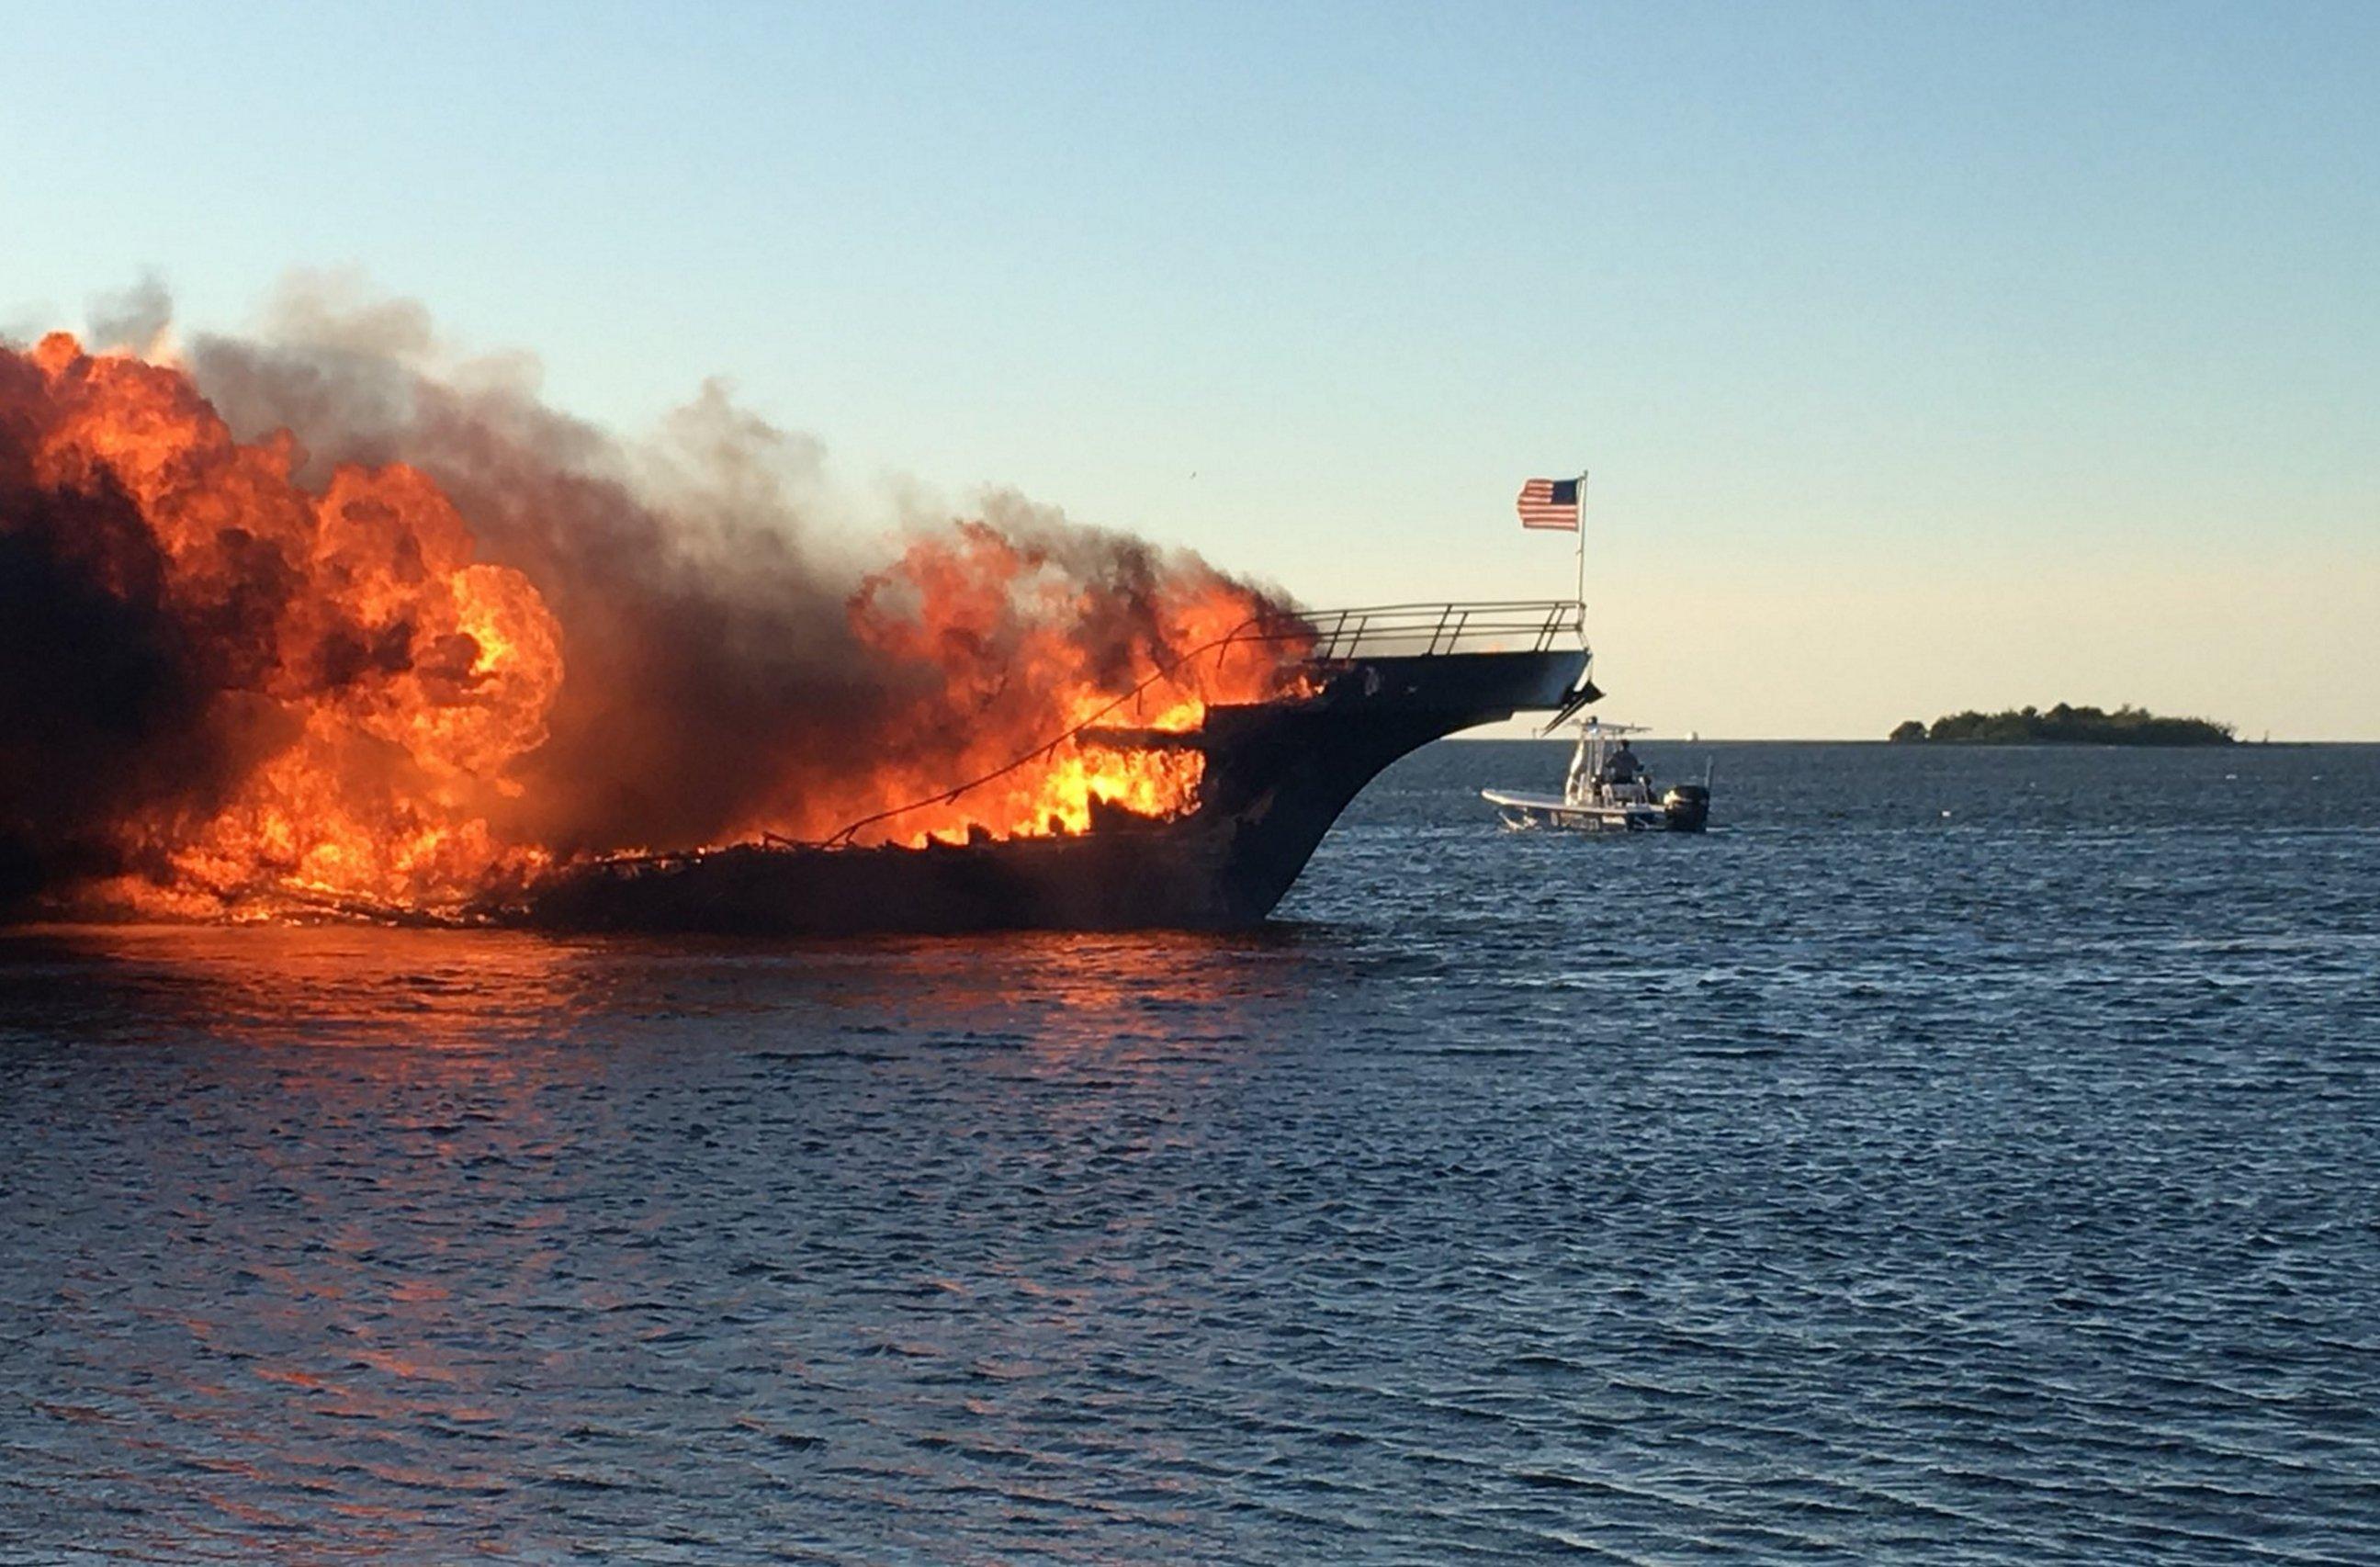 Florida casino shuttle boat bursts into flames, leaving 1 dead